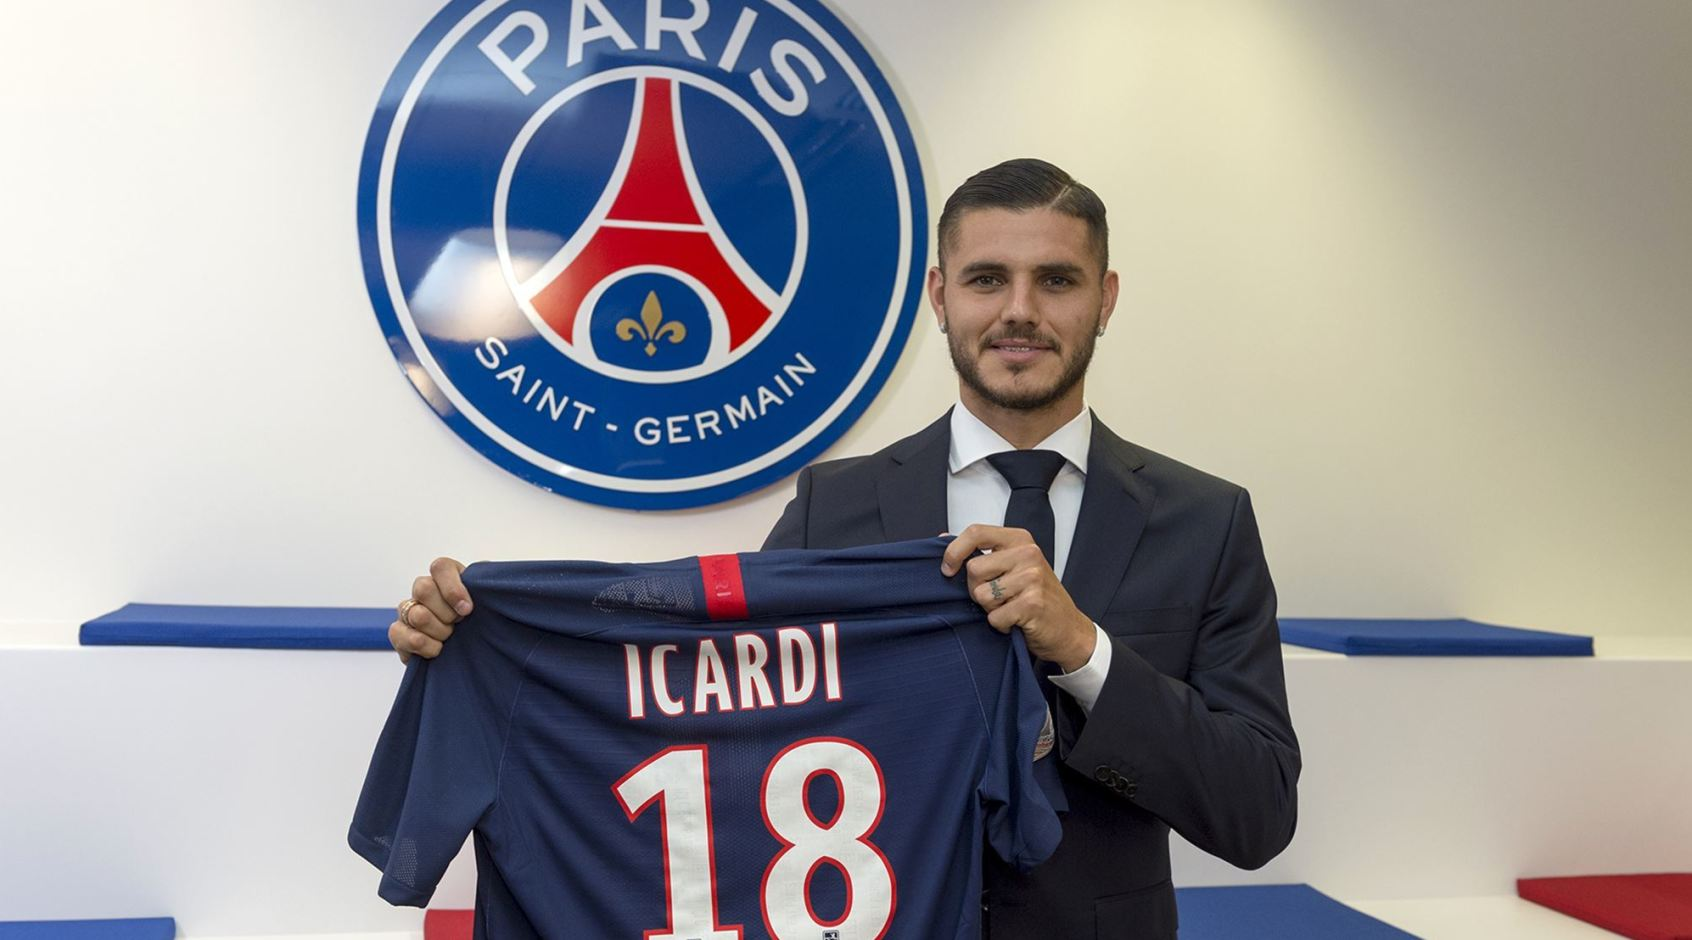 Официально: Мауро Икарди подписал контракт с ПСЖ